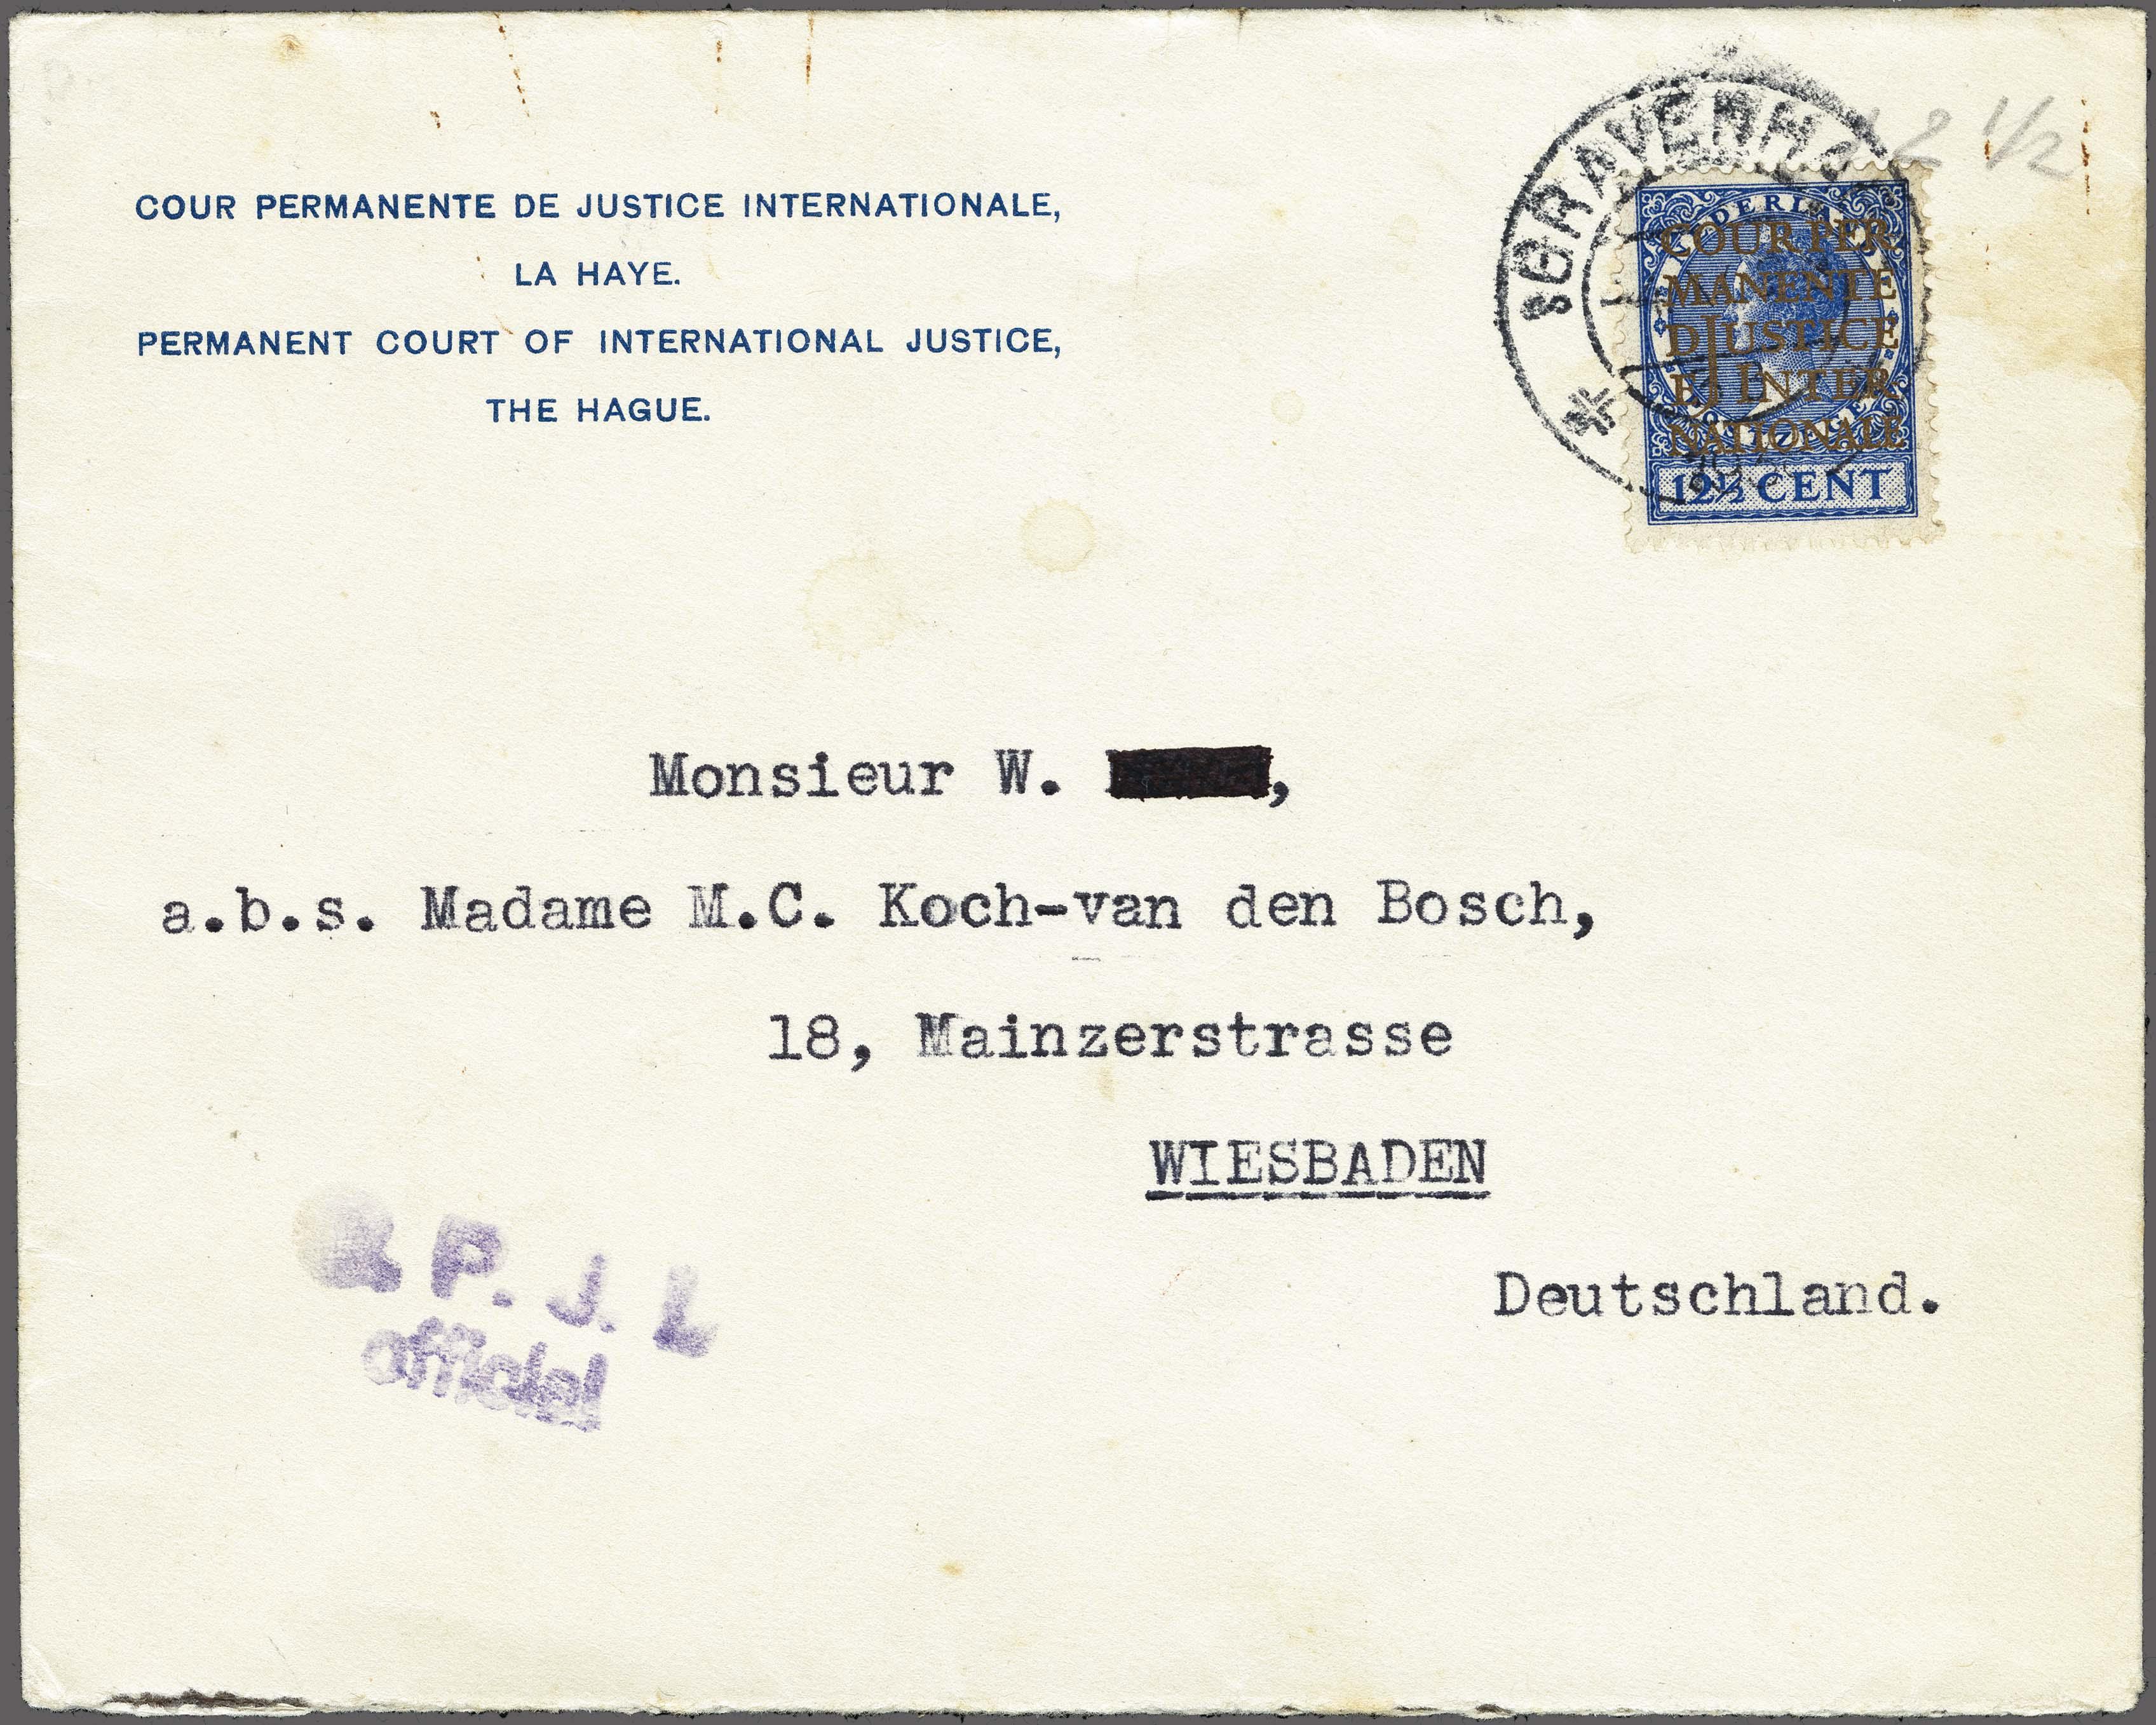 Lot 2635 - Netherlands and former colonies Netherlands Official Stamps -  Corinphila Veilingen Auction 250-253 - Day 3 - Netherlands and former colonies - Single lots & Picture postcards